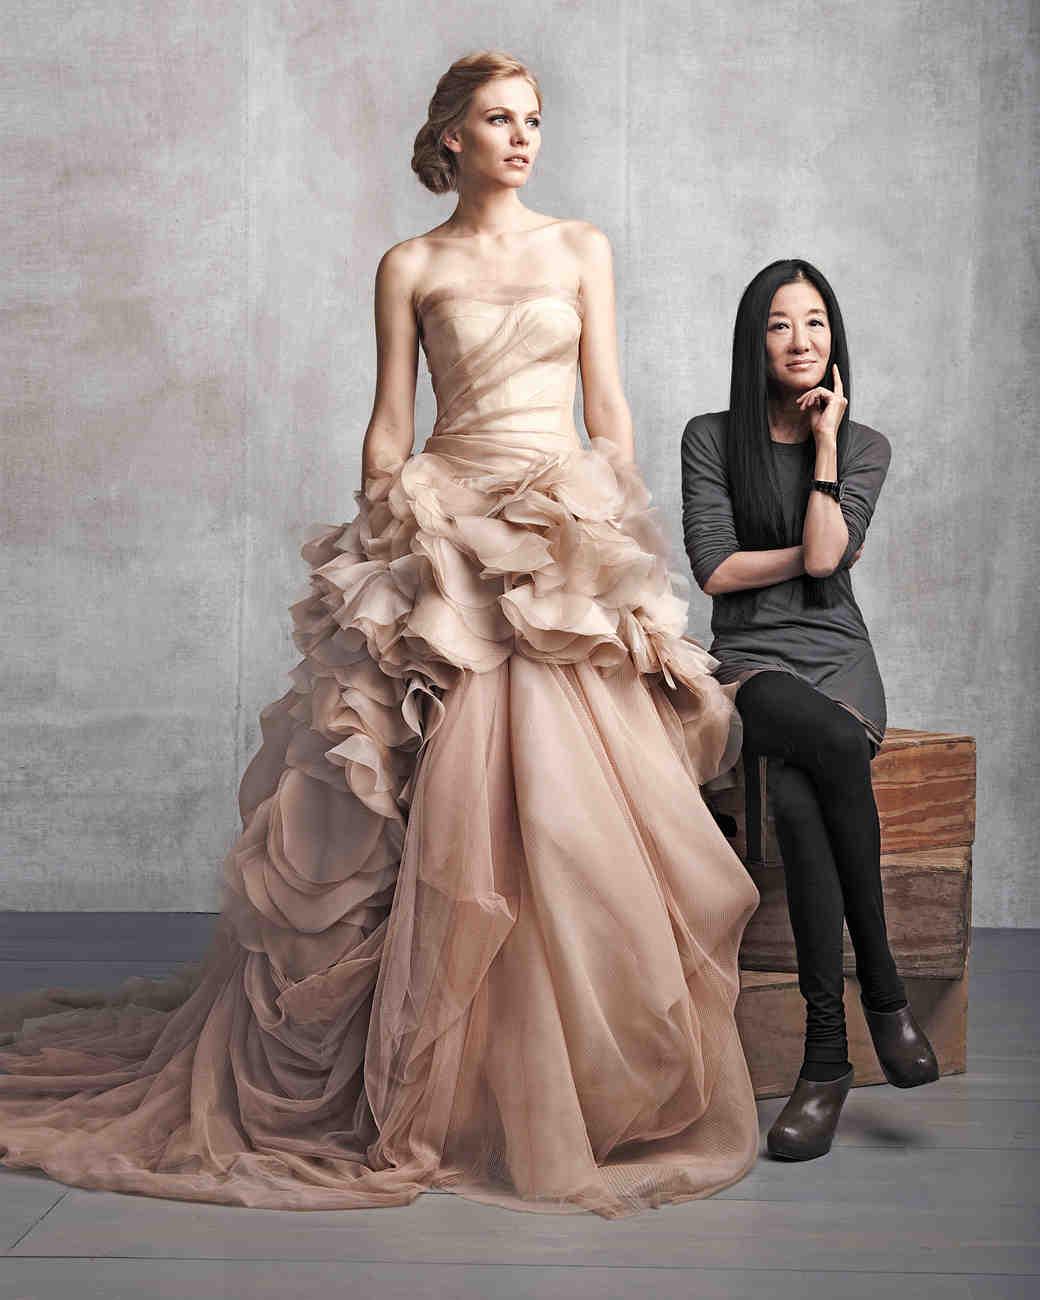 518bec4d046c Iconic Wedding-Dress Designers | Martha Stewart Weddings